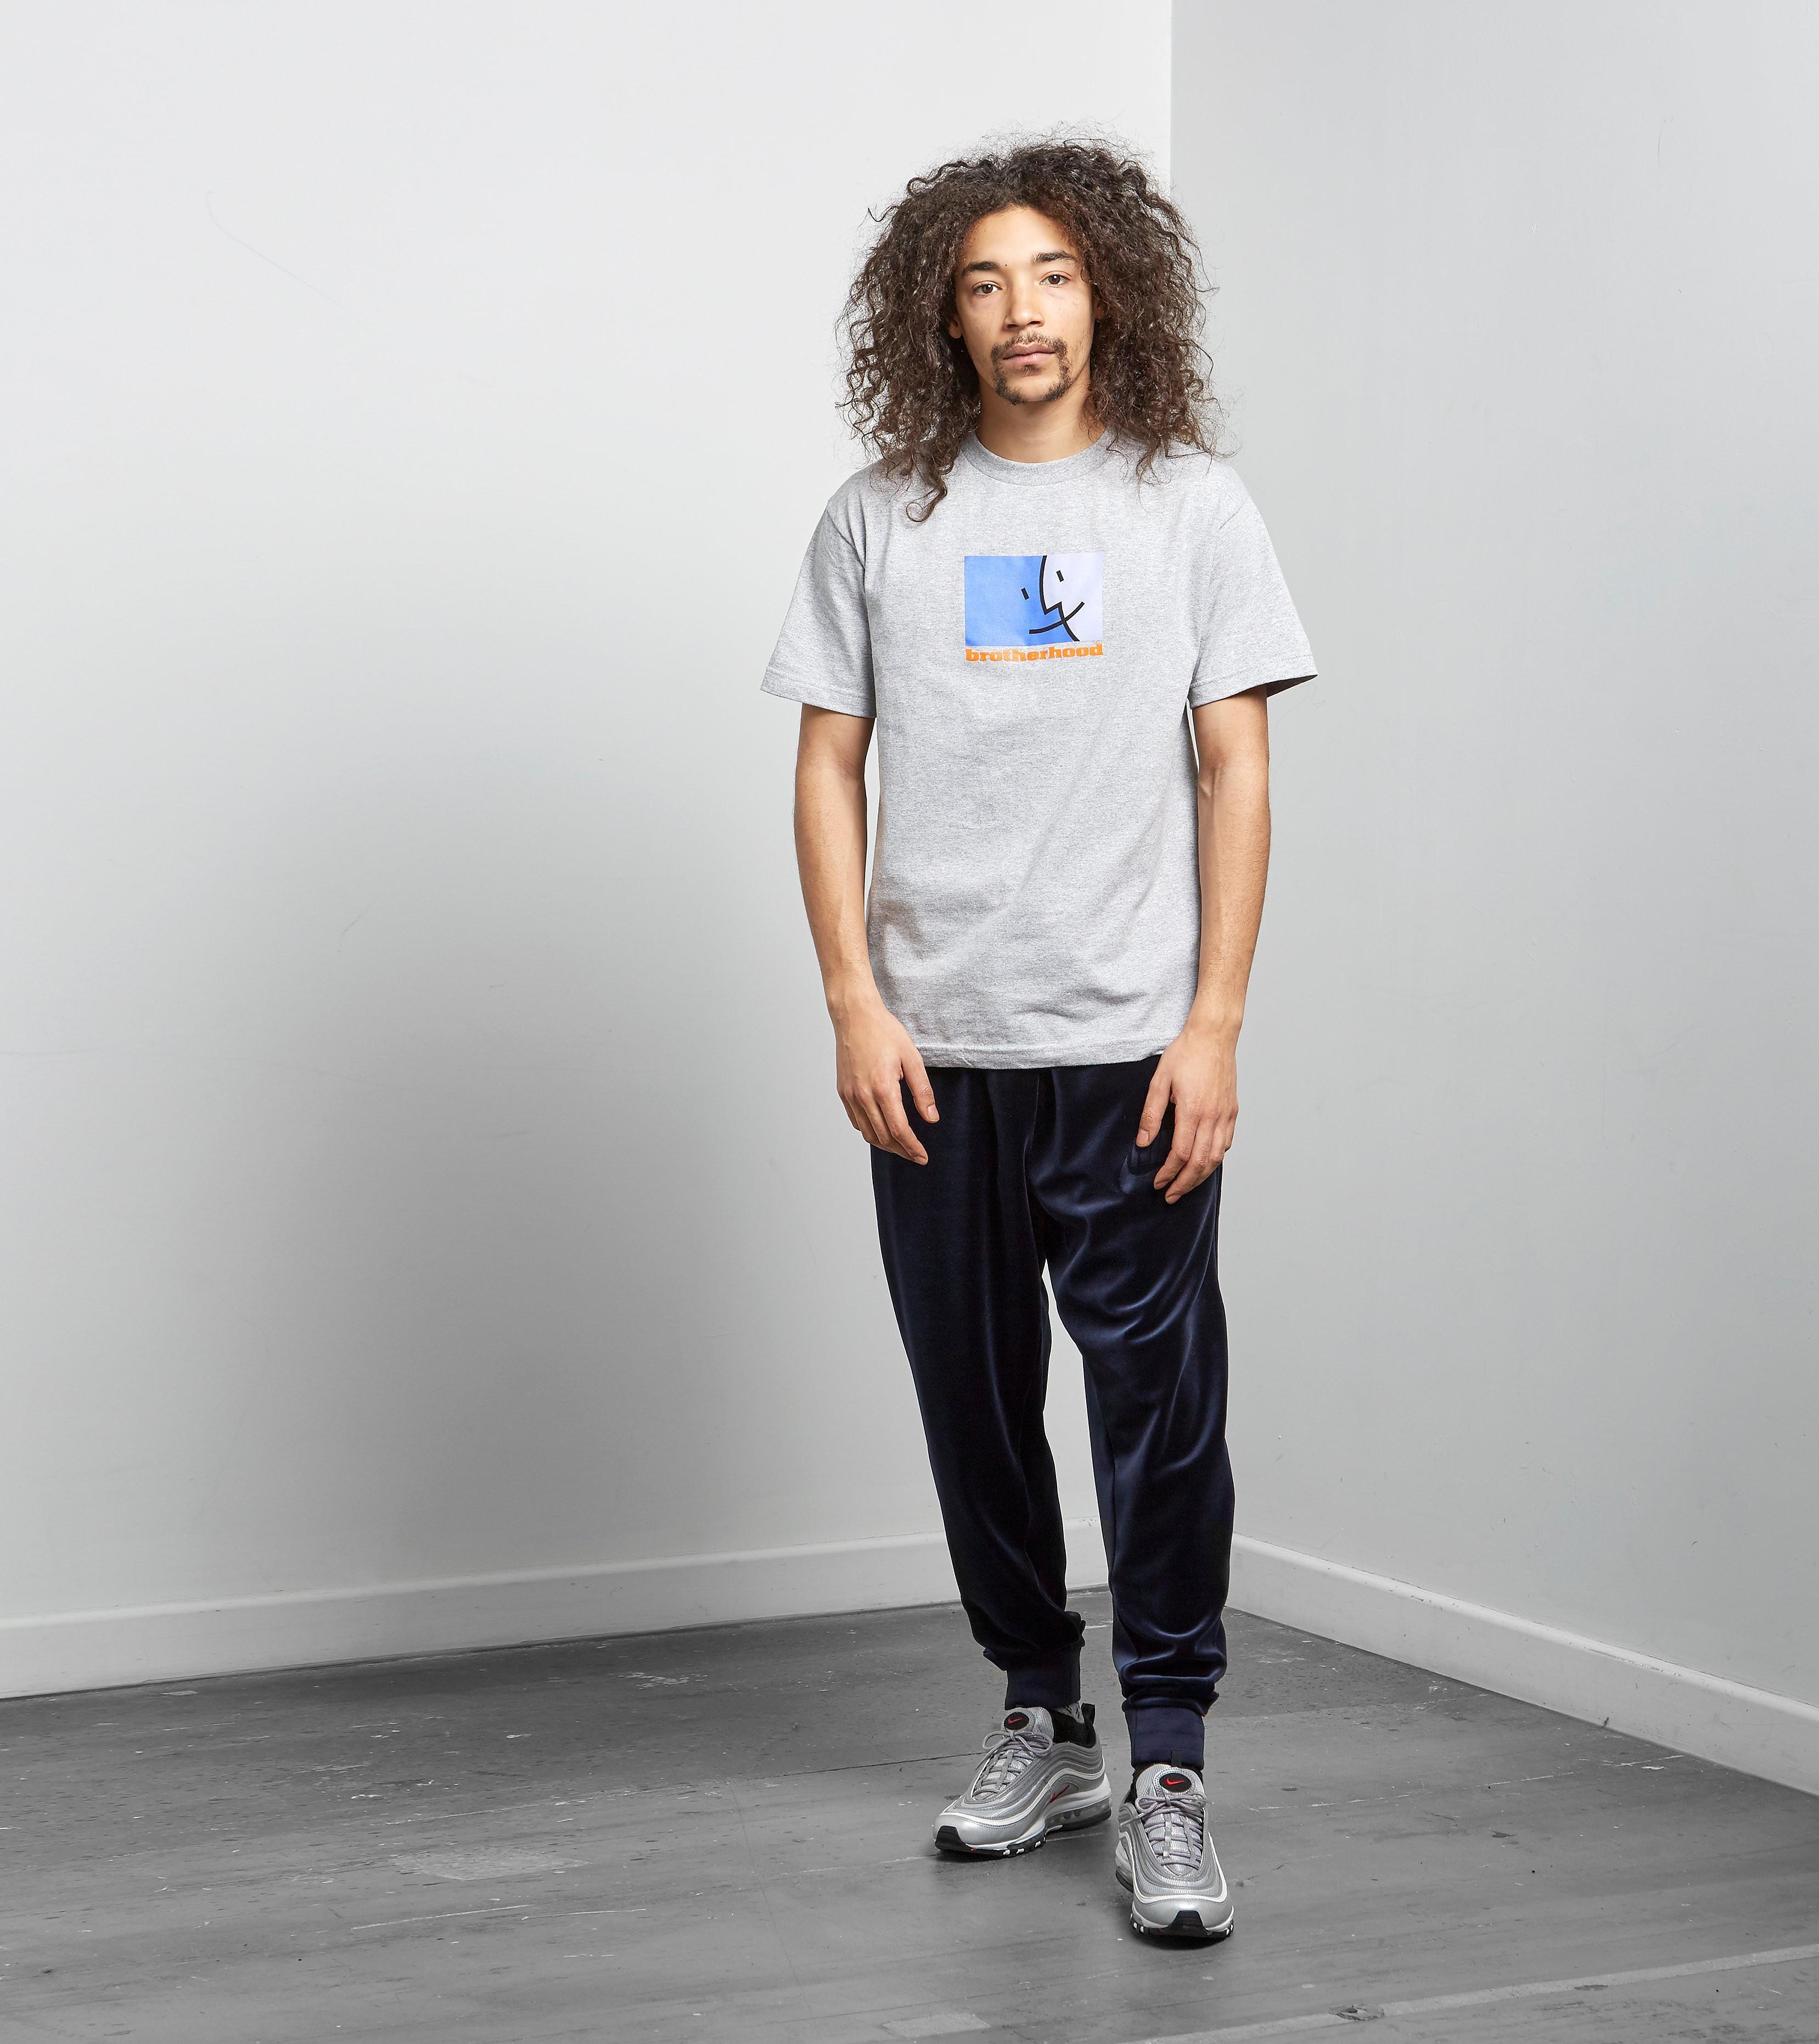 Brotherhood T-Shirt Finder